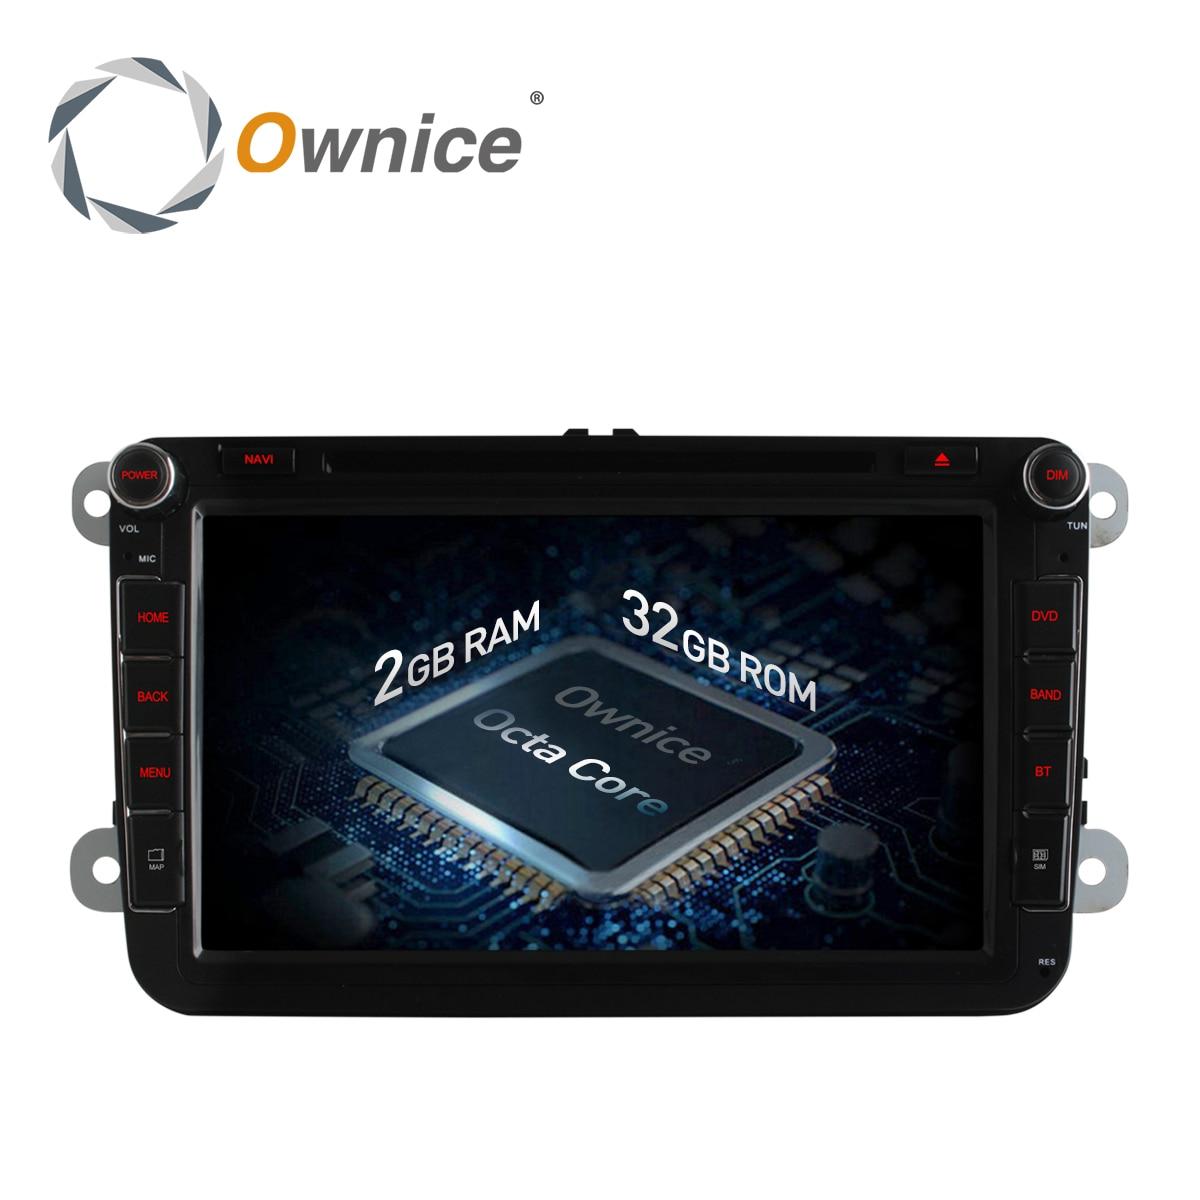 "imágenes para 8 ""Ownice Android 6.0 Octa 8 Core GPS DVD Del Coche para Volkswagen golf 4 golf 5 6 passat B6 touran sharan jetta caddy 4G LTE red"